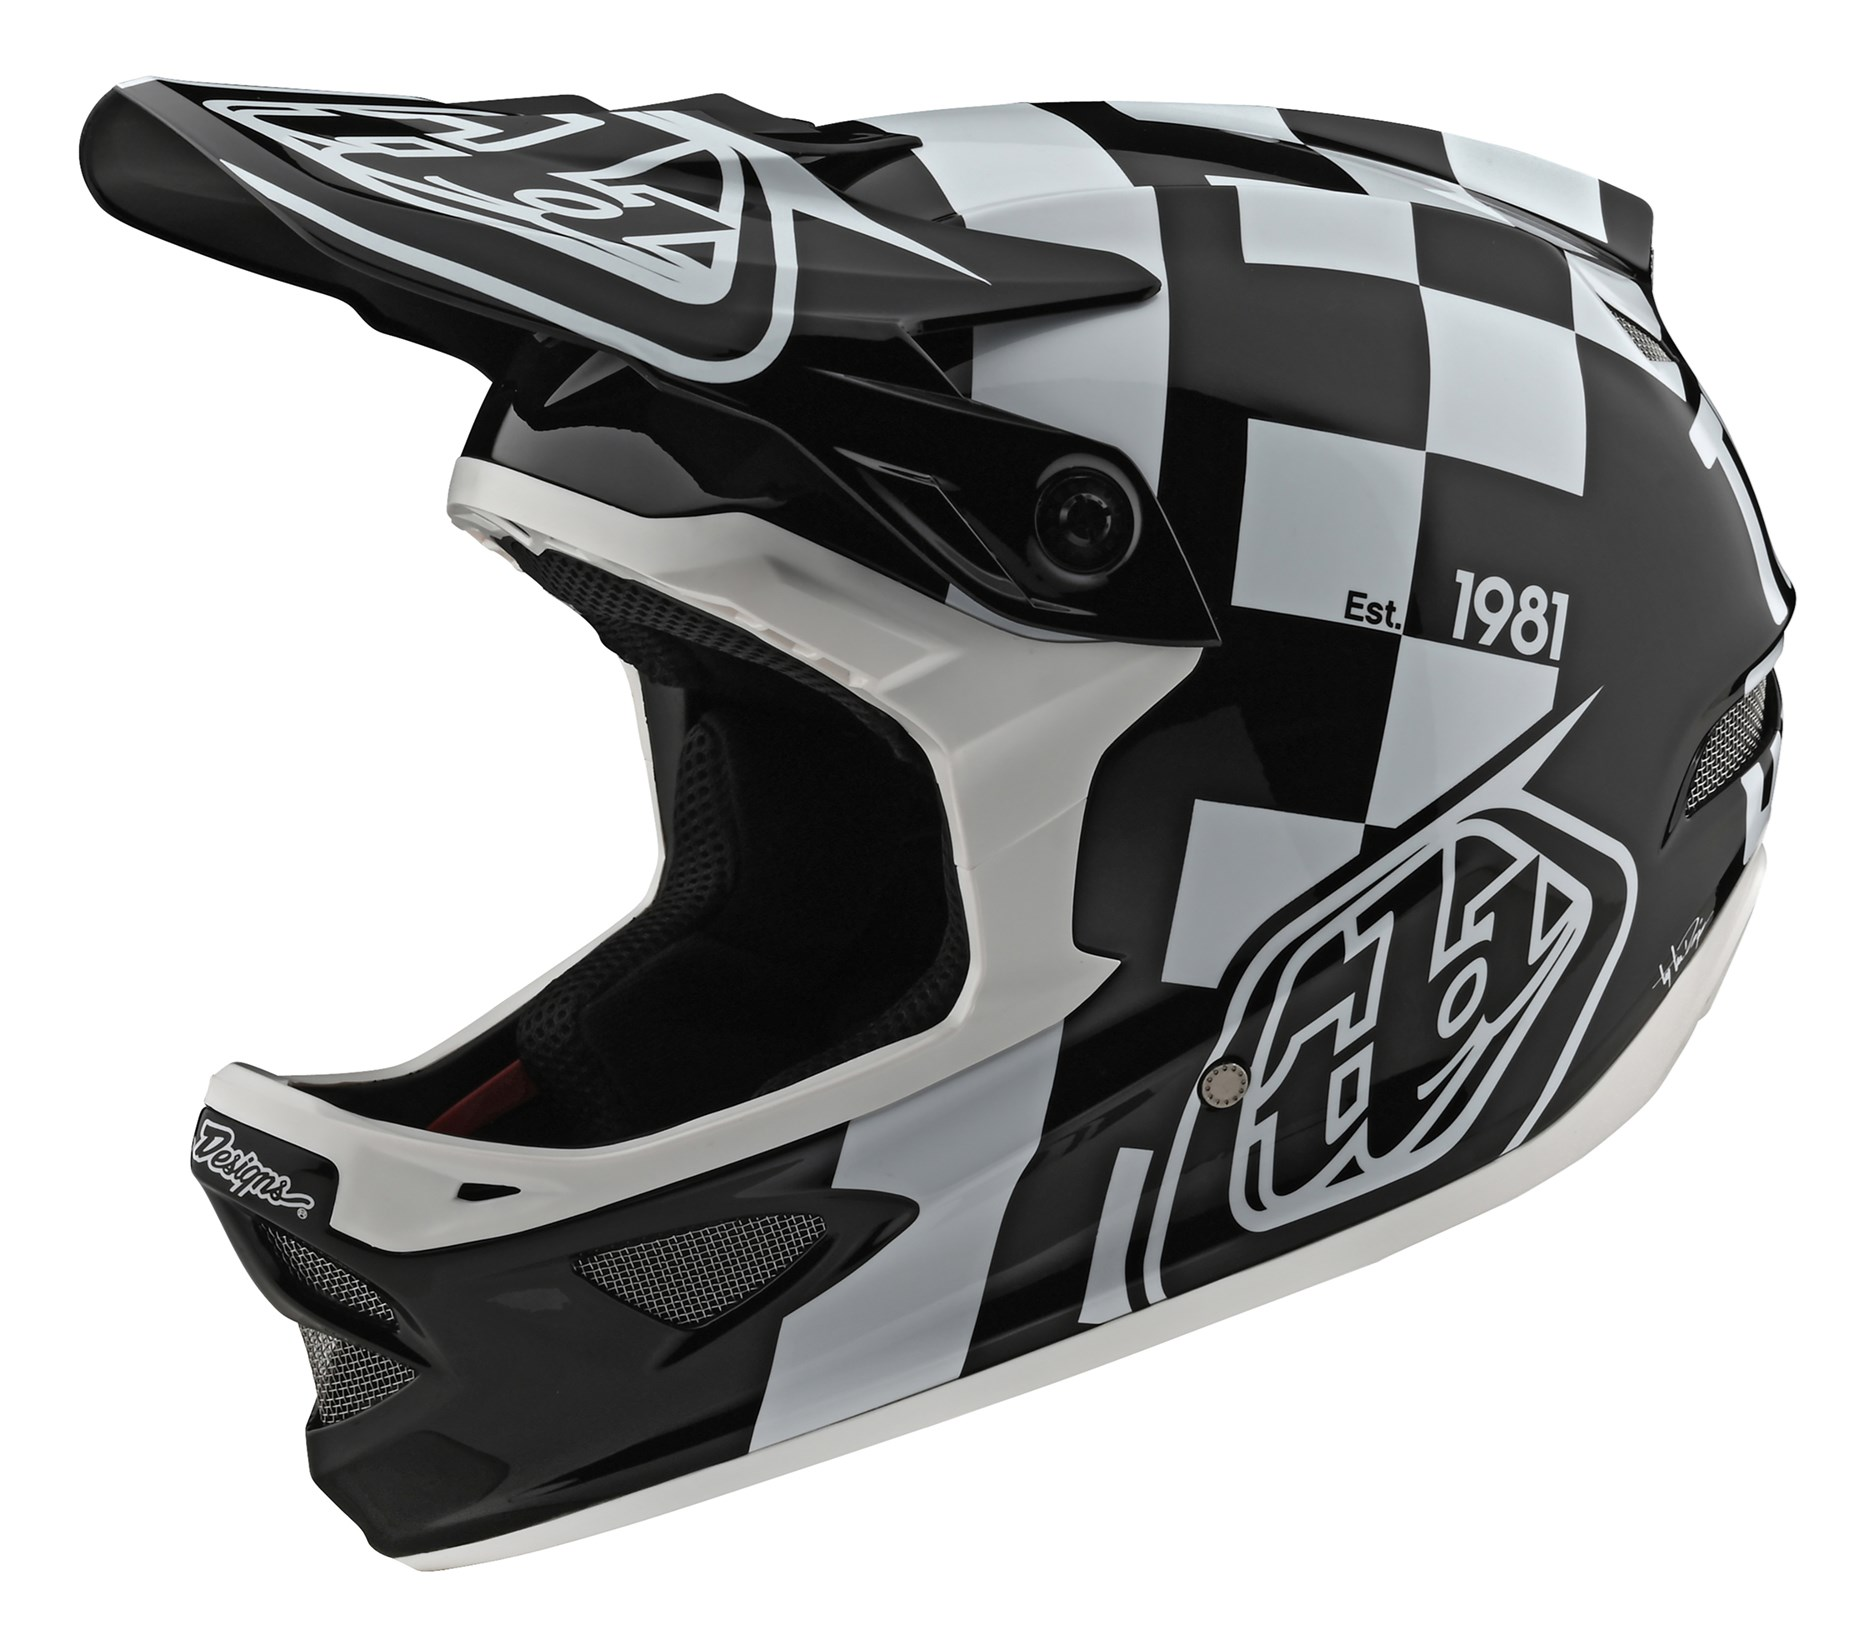 Troy Lee Designs D4 Carbon Slash Adult Off-Road BMX Cycling Helmet